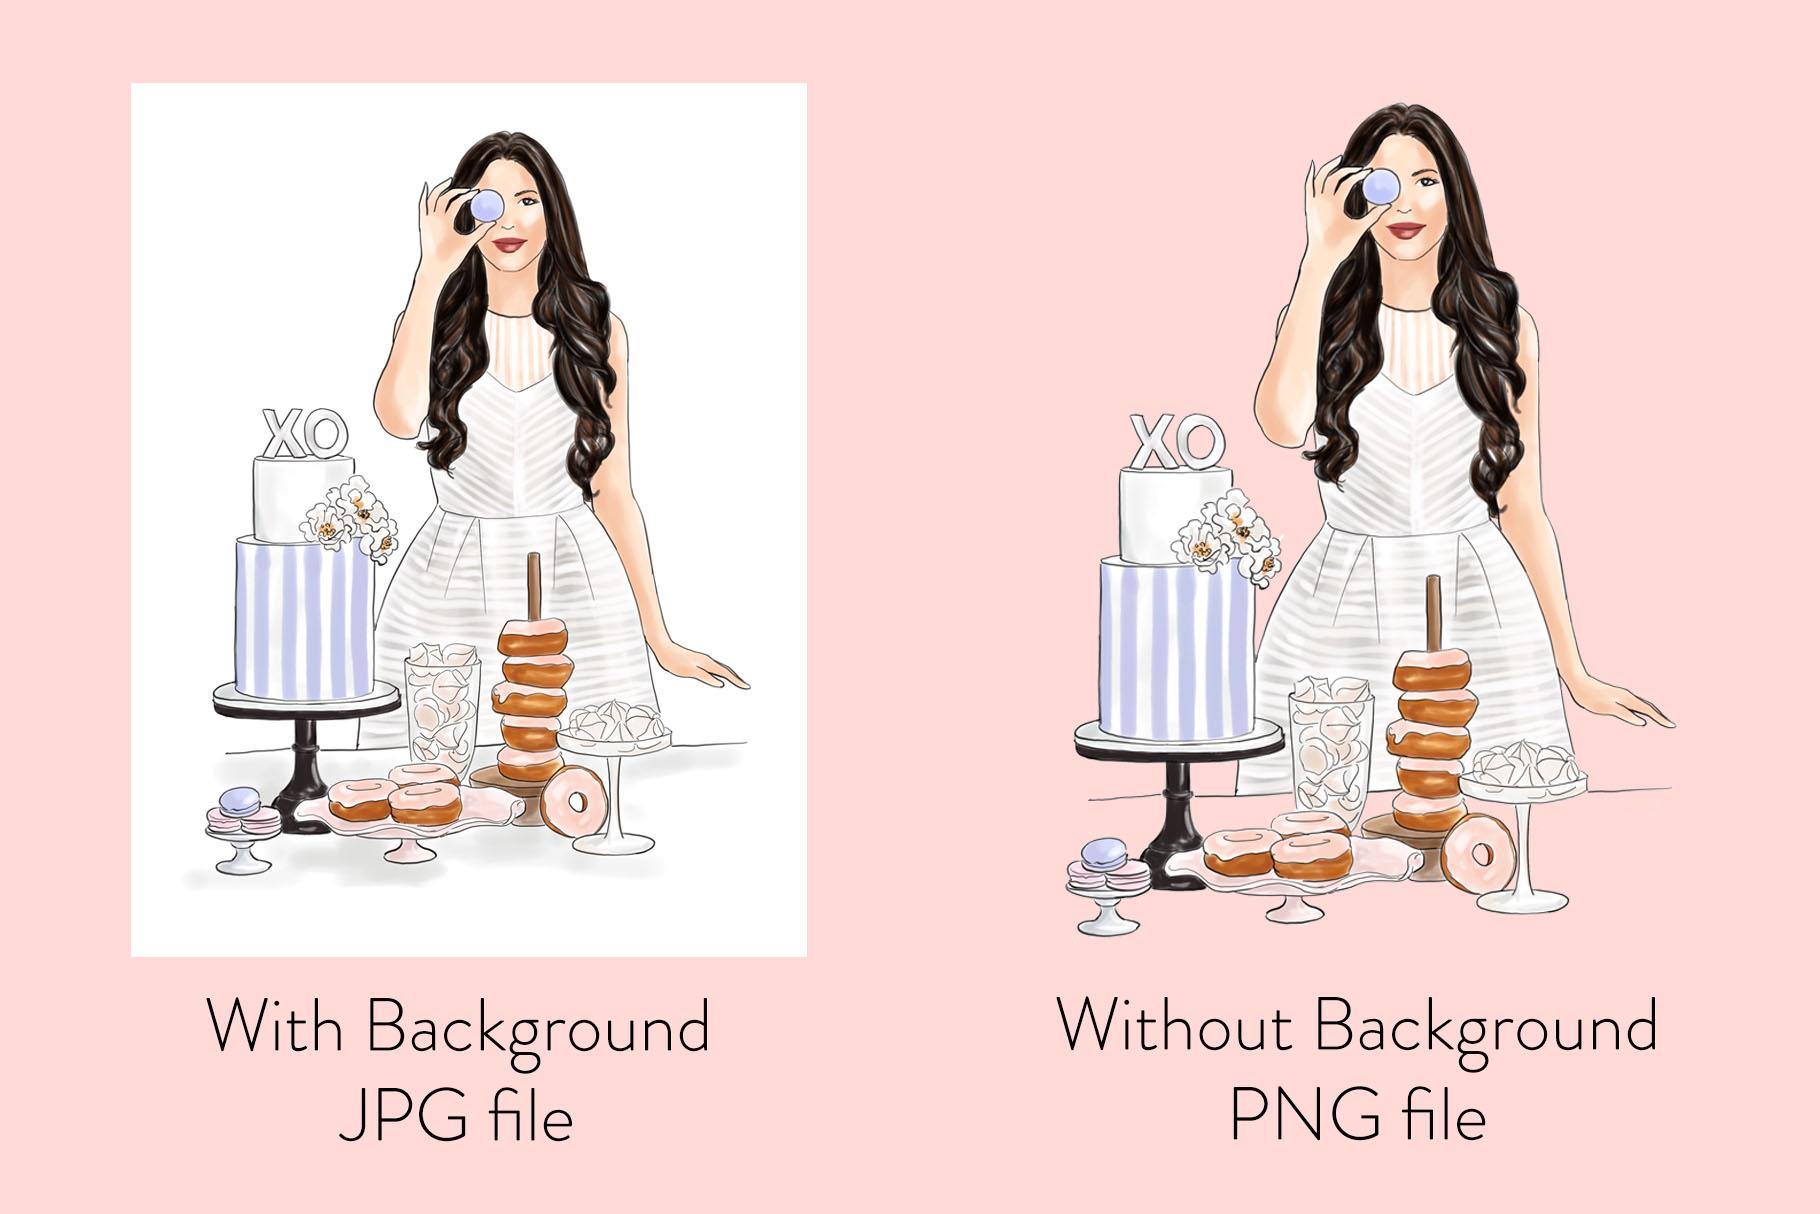 Fashion illustration - Baker Girl - Light Skin example image 2